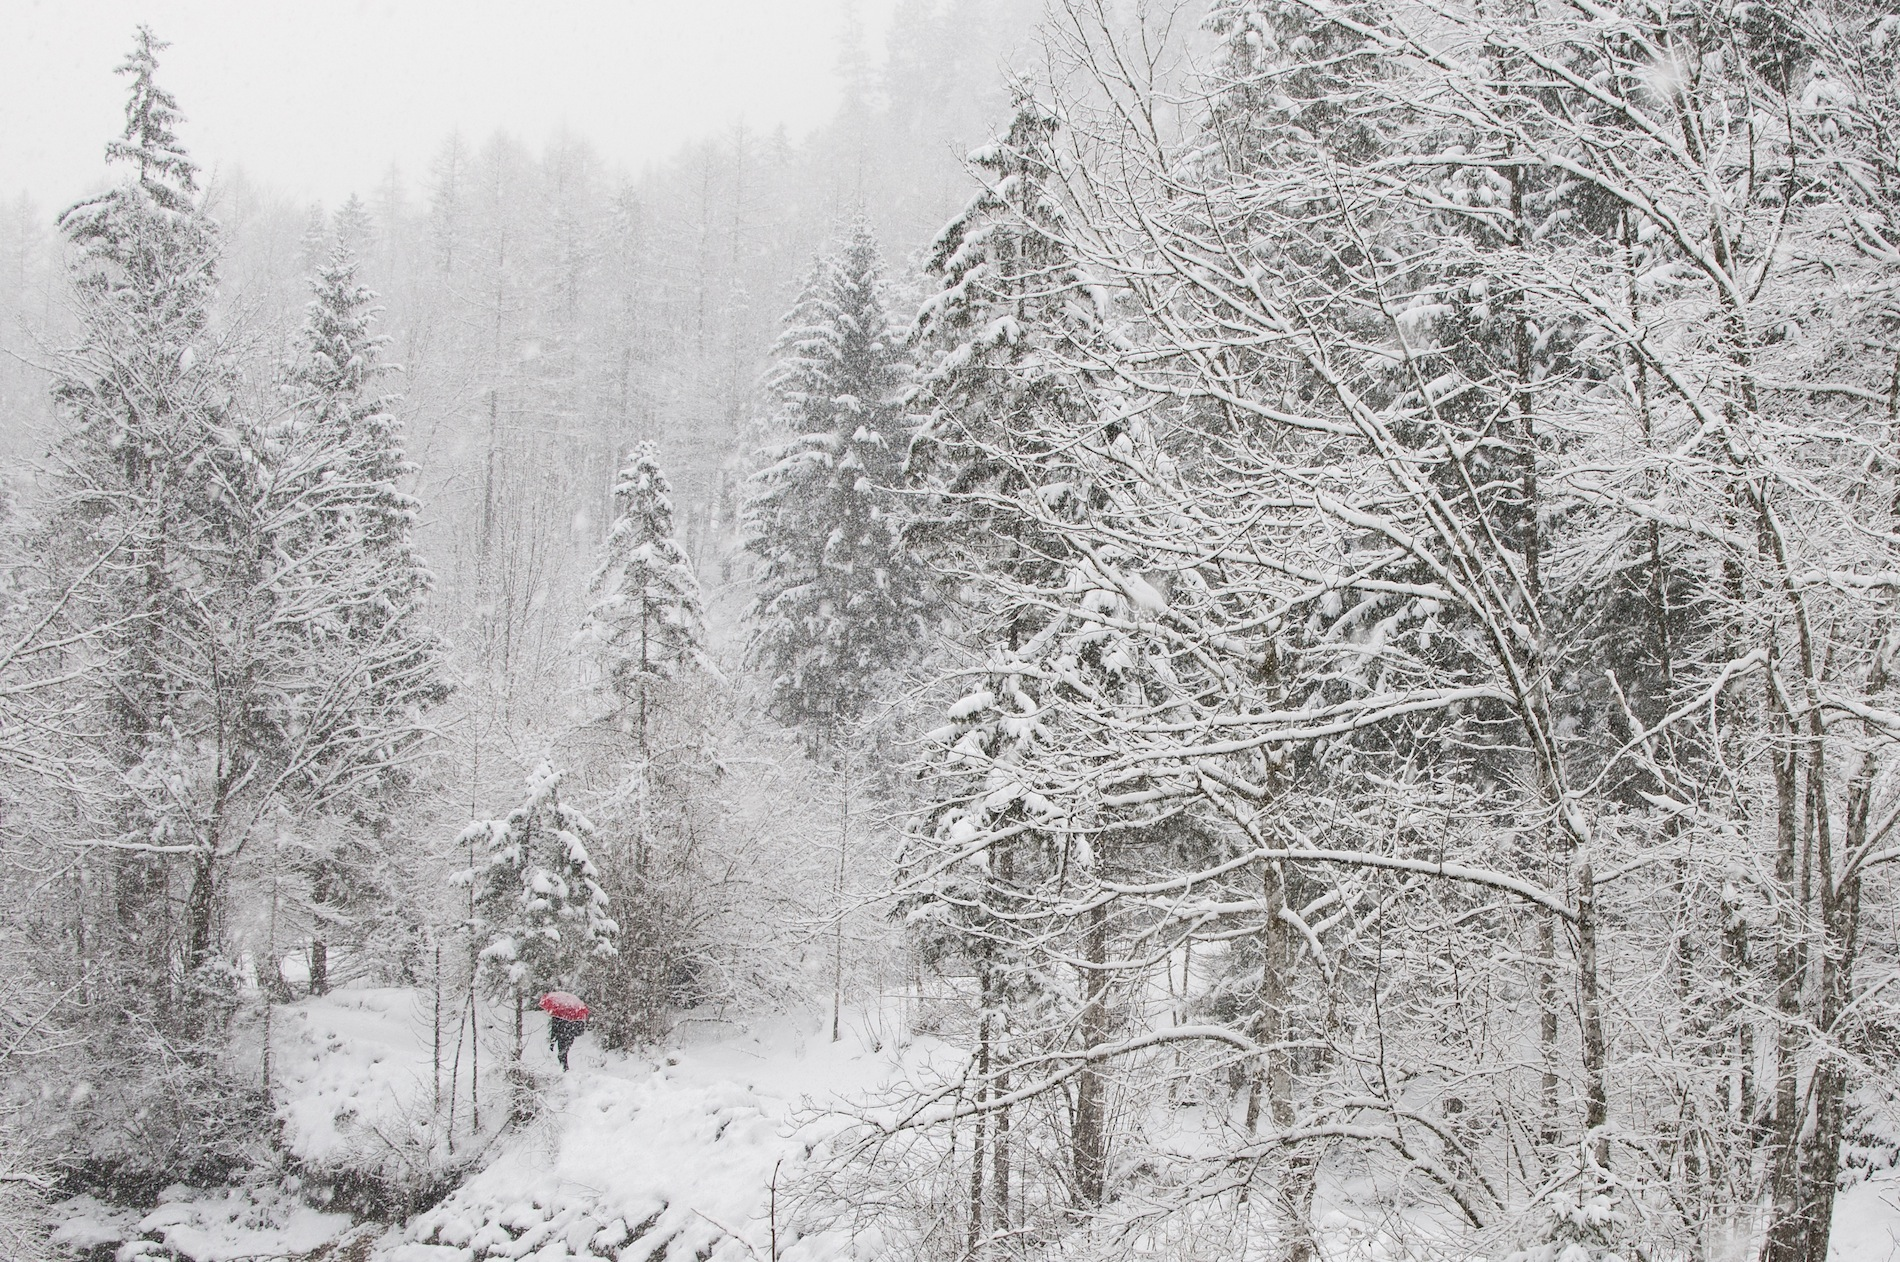 Winterfotografie mit Thomas Hackl